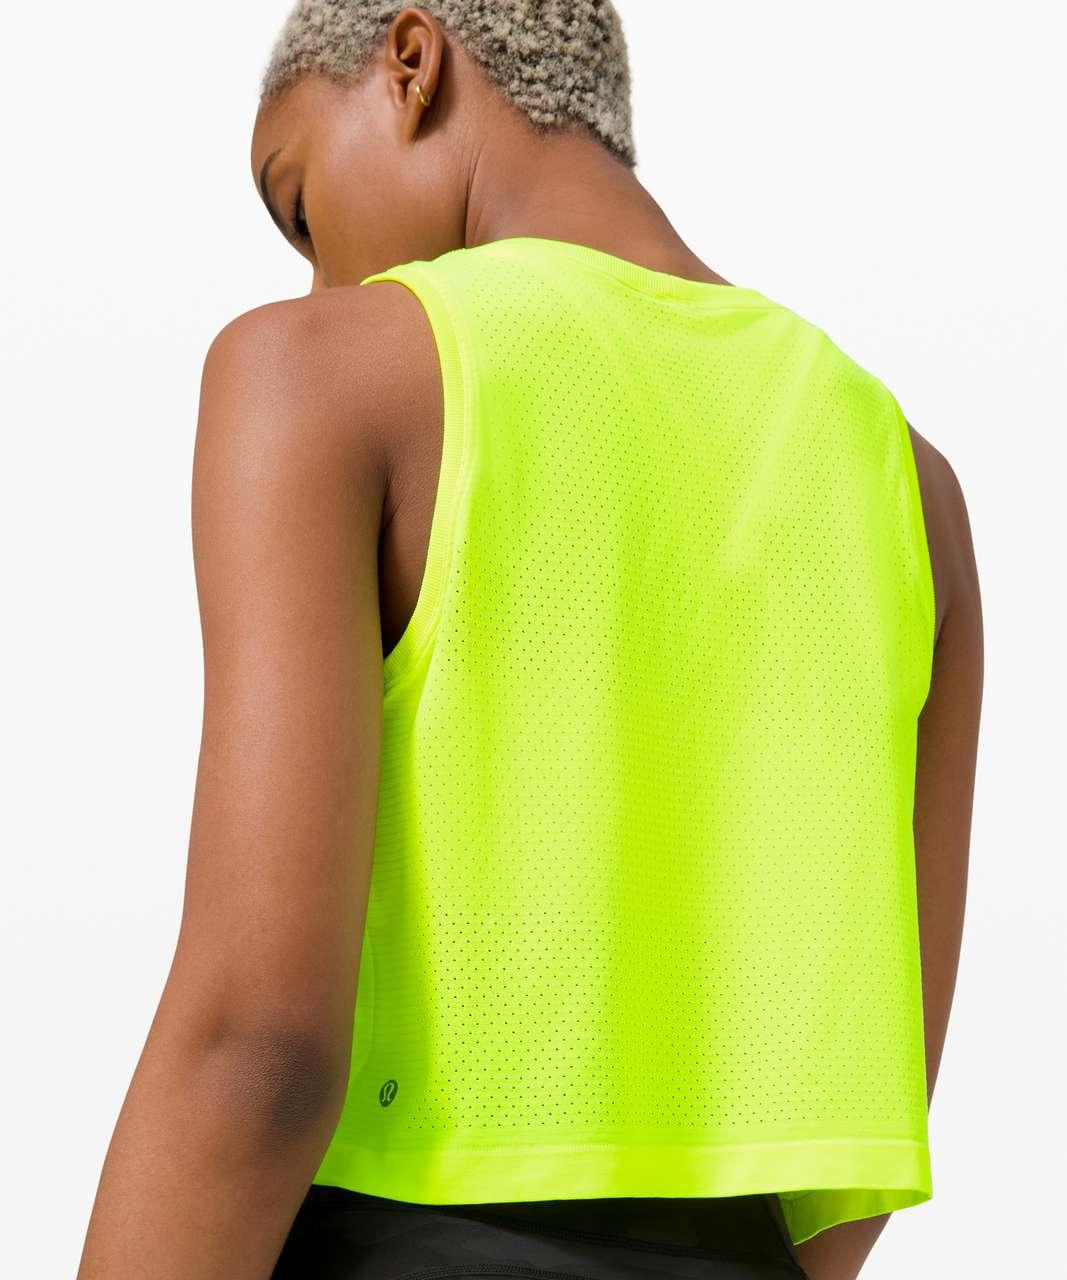 Lululemon Swiftly Breathe Crop Tank - Yellow Highlight / Yellow Highlight